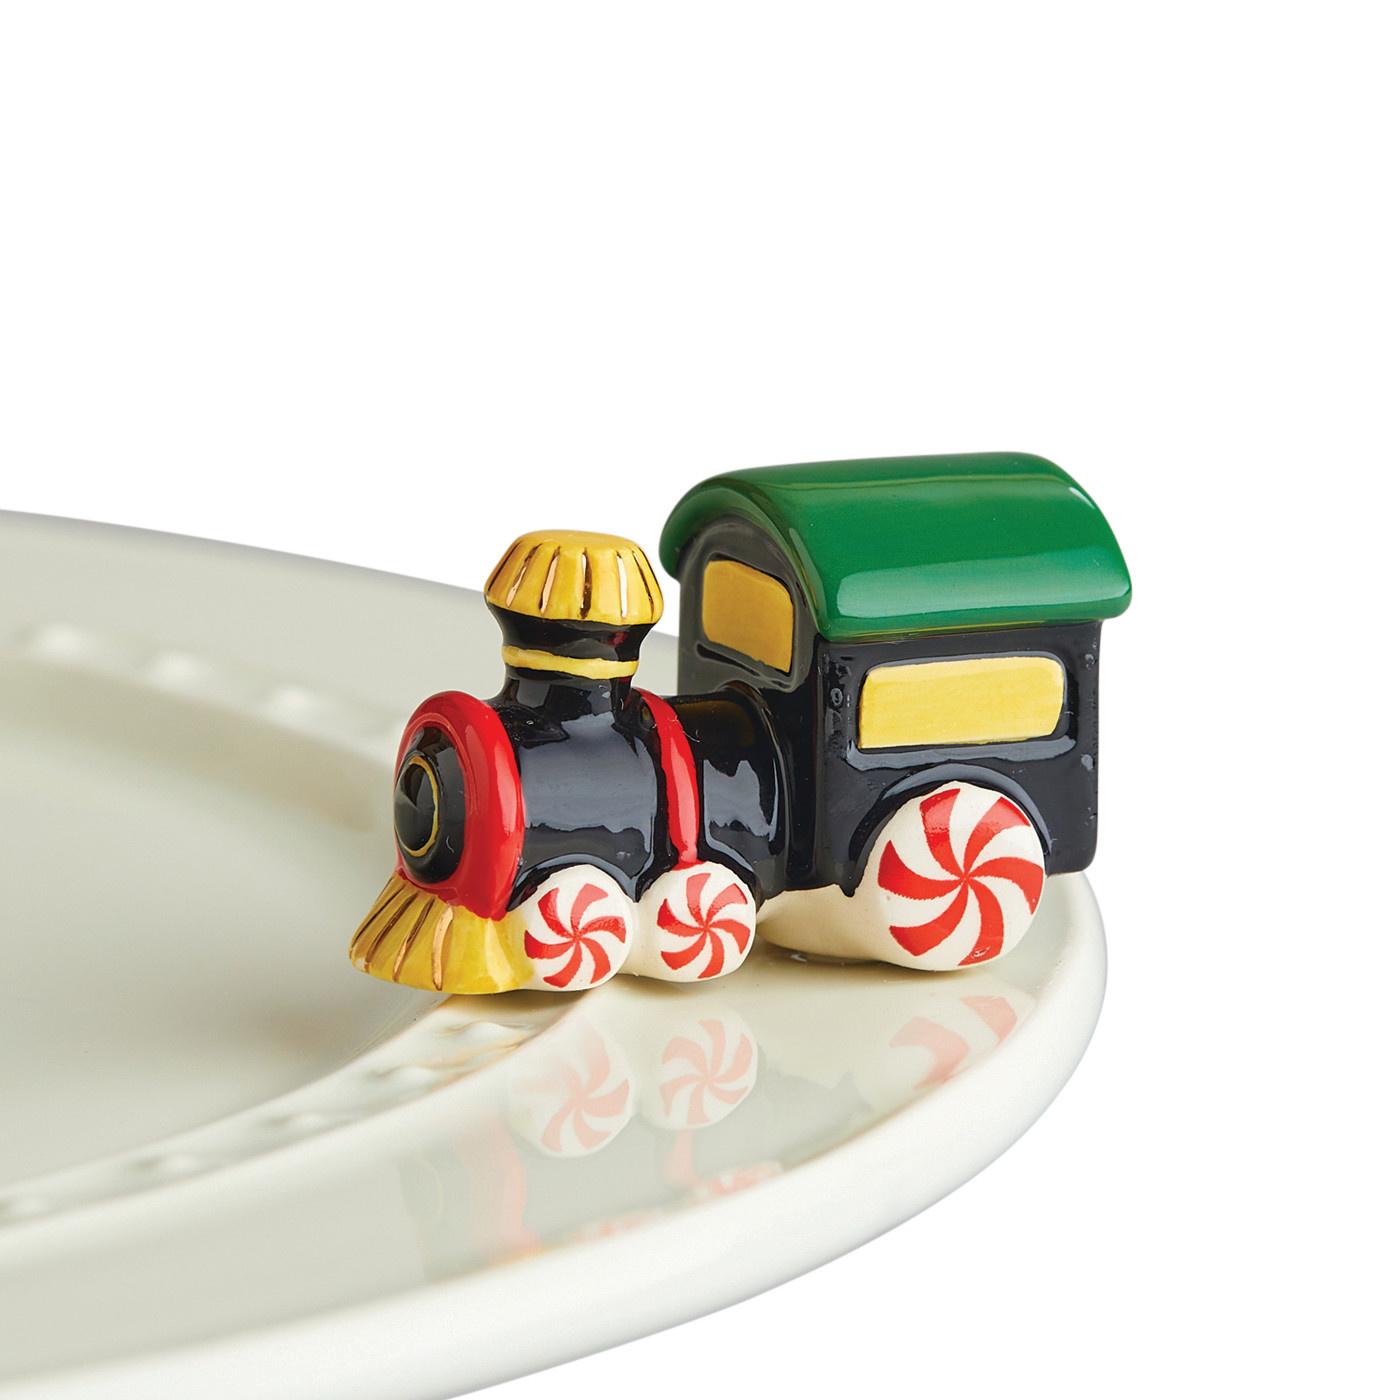 nora fleming St Jude Train mini (all profits are donated)